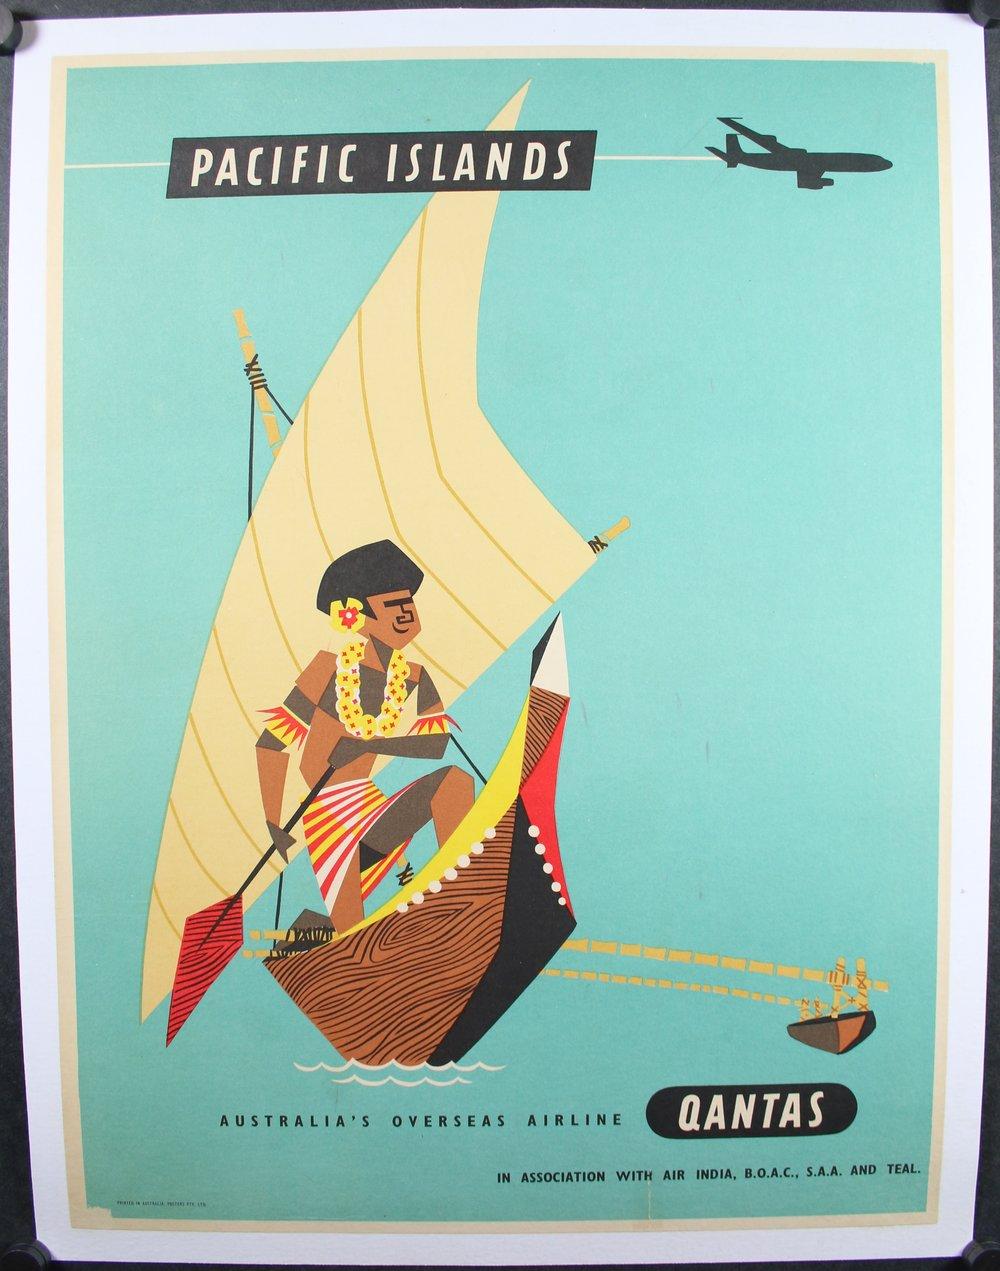 Vintage Airline travel posters Vintage cookbooks00071.jpg